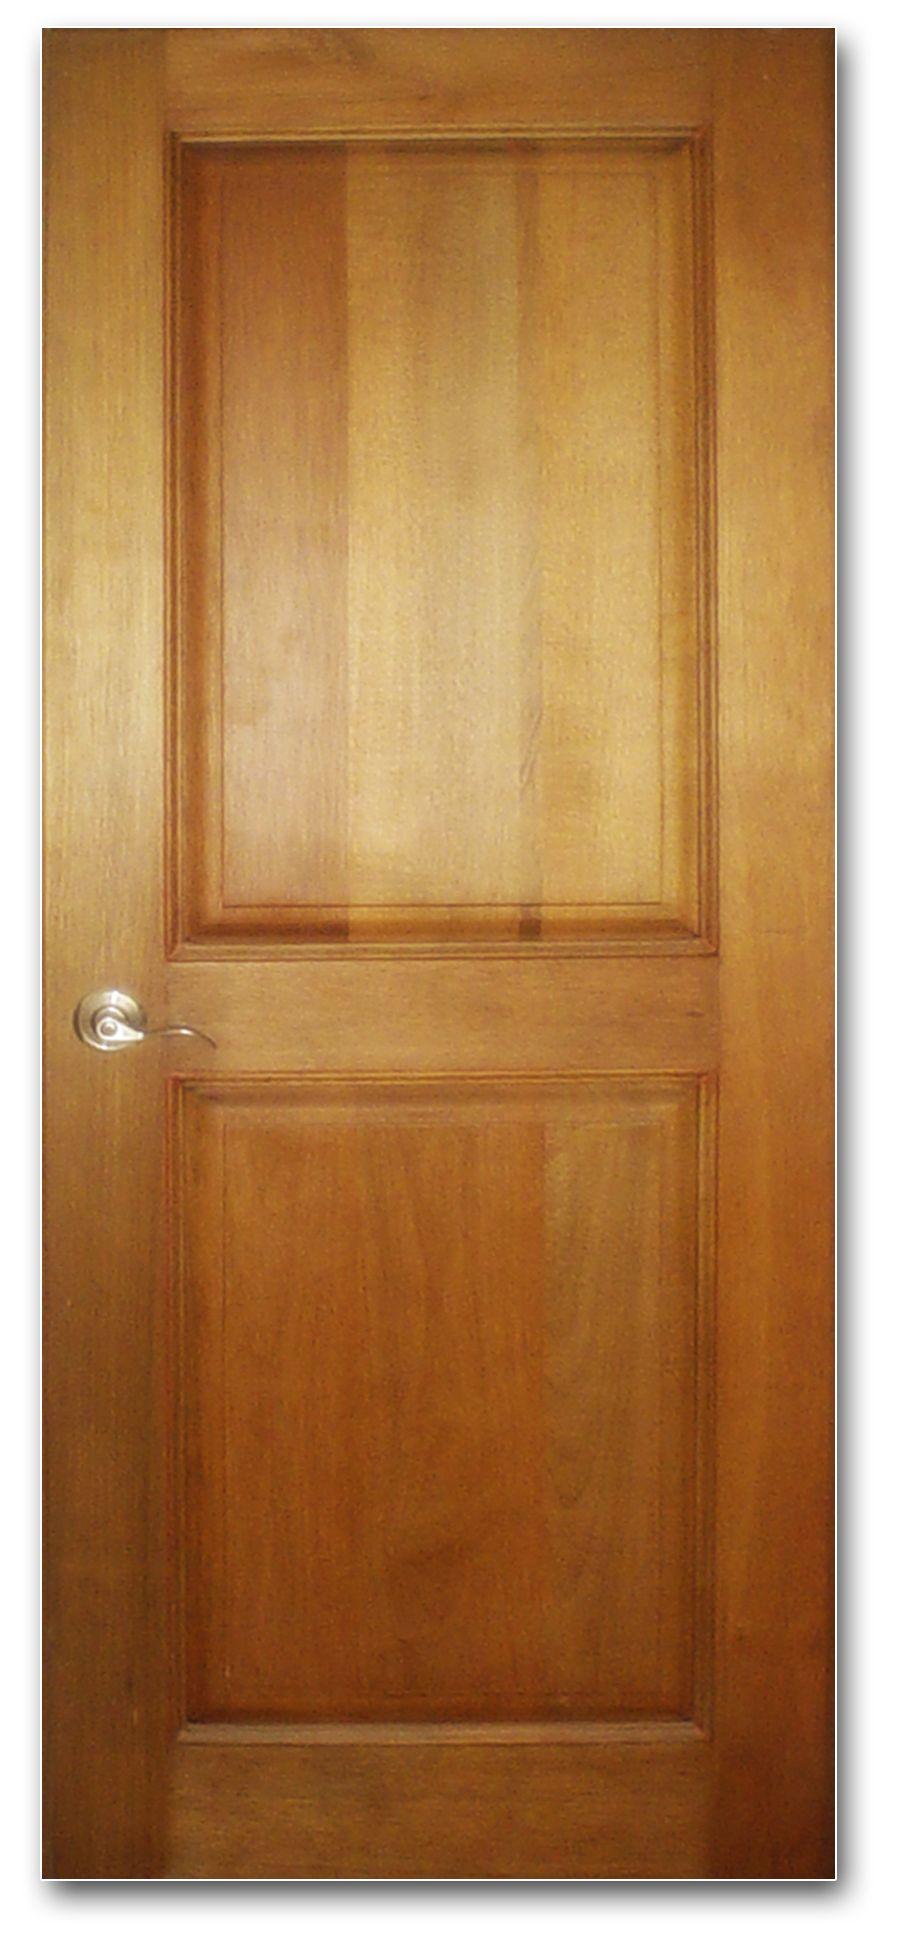 Pin De Carpinteria D C En Puertas Doors Puertas De Cedro Puertas De Madera Muebles De Carpintería